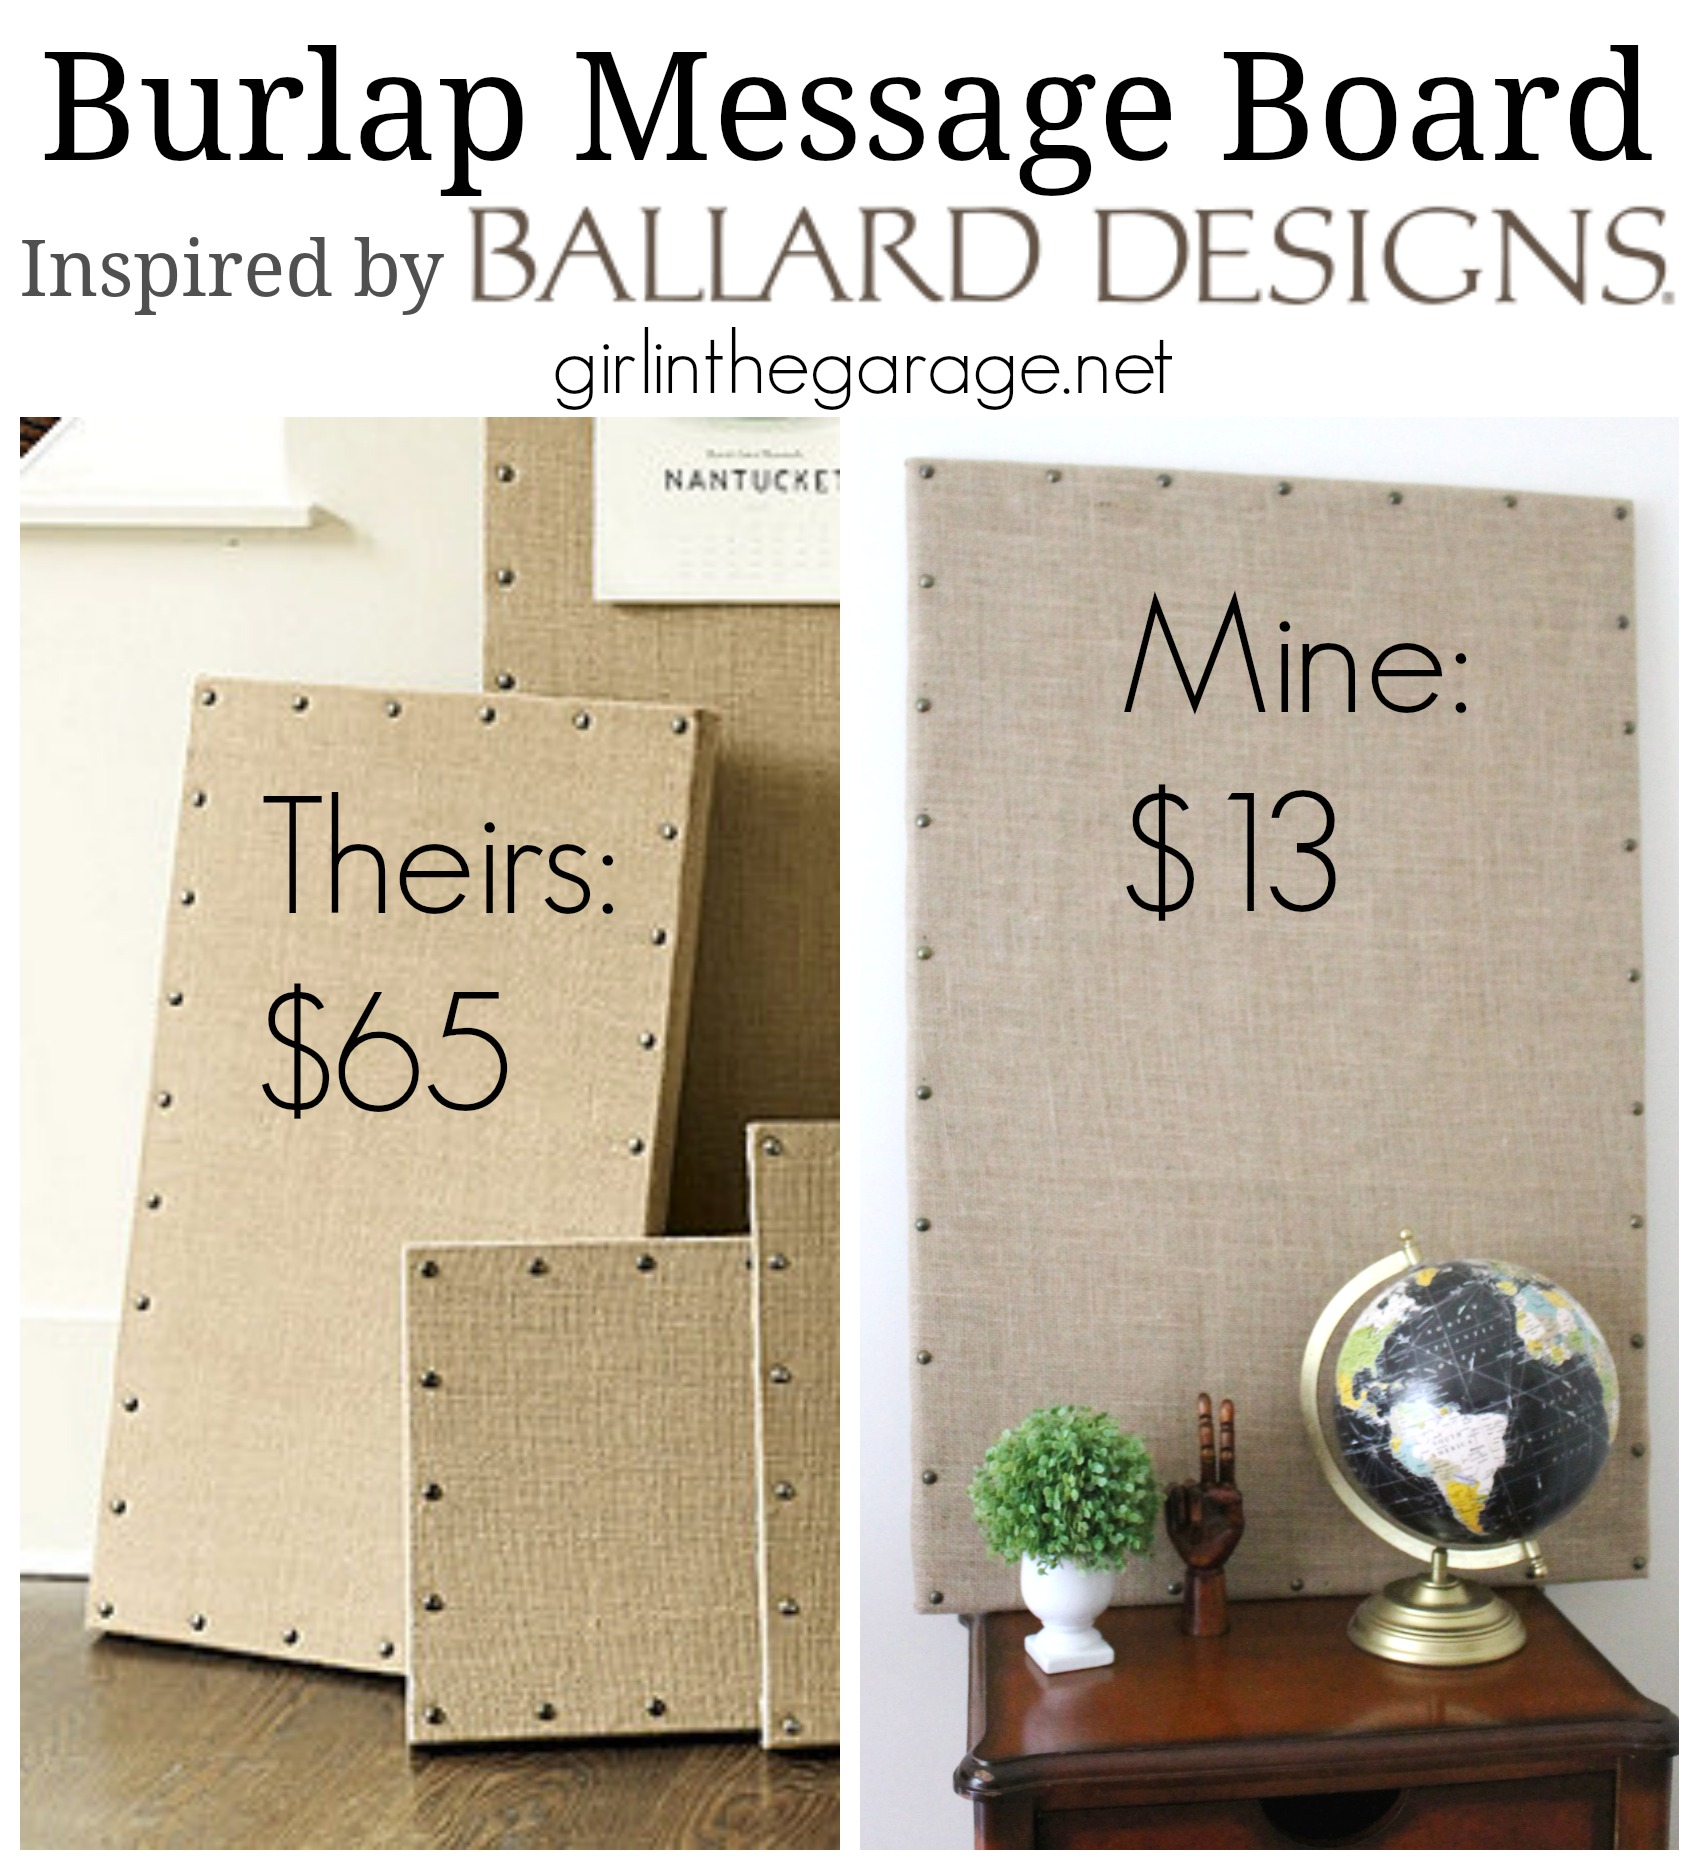 Burlap Message Board Inspired By Ballard Designs